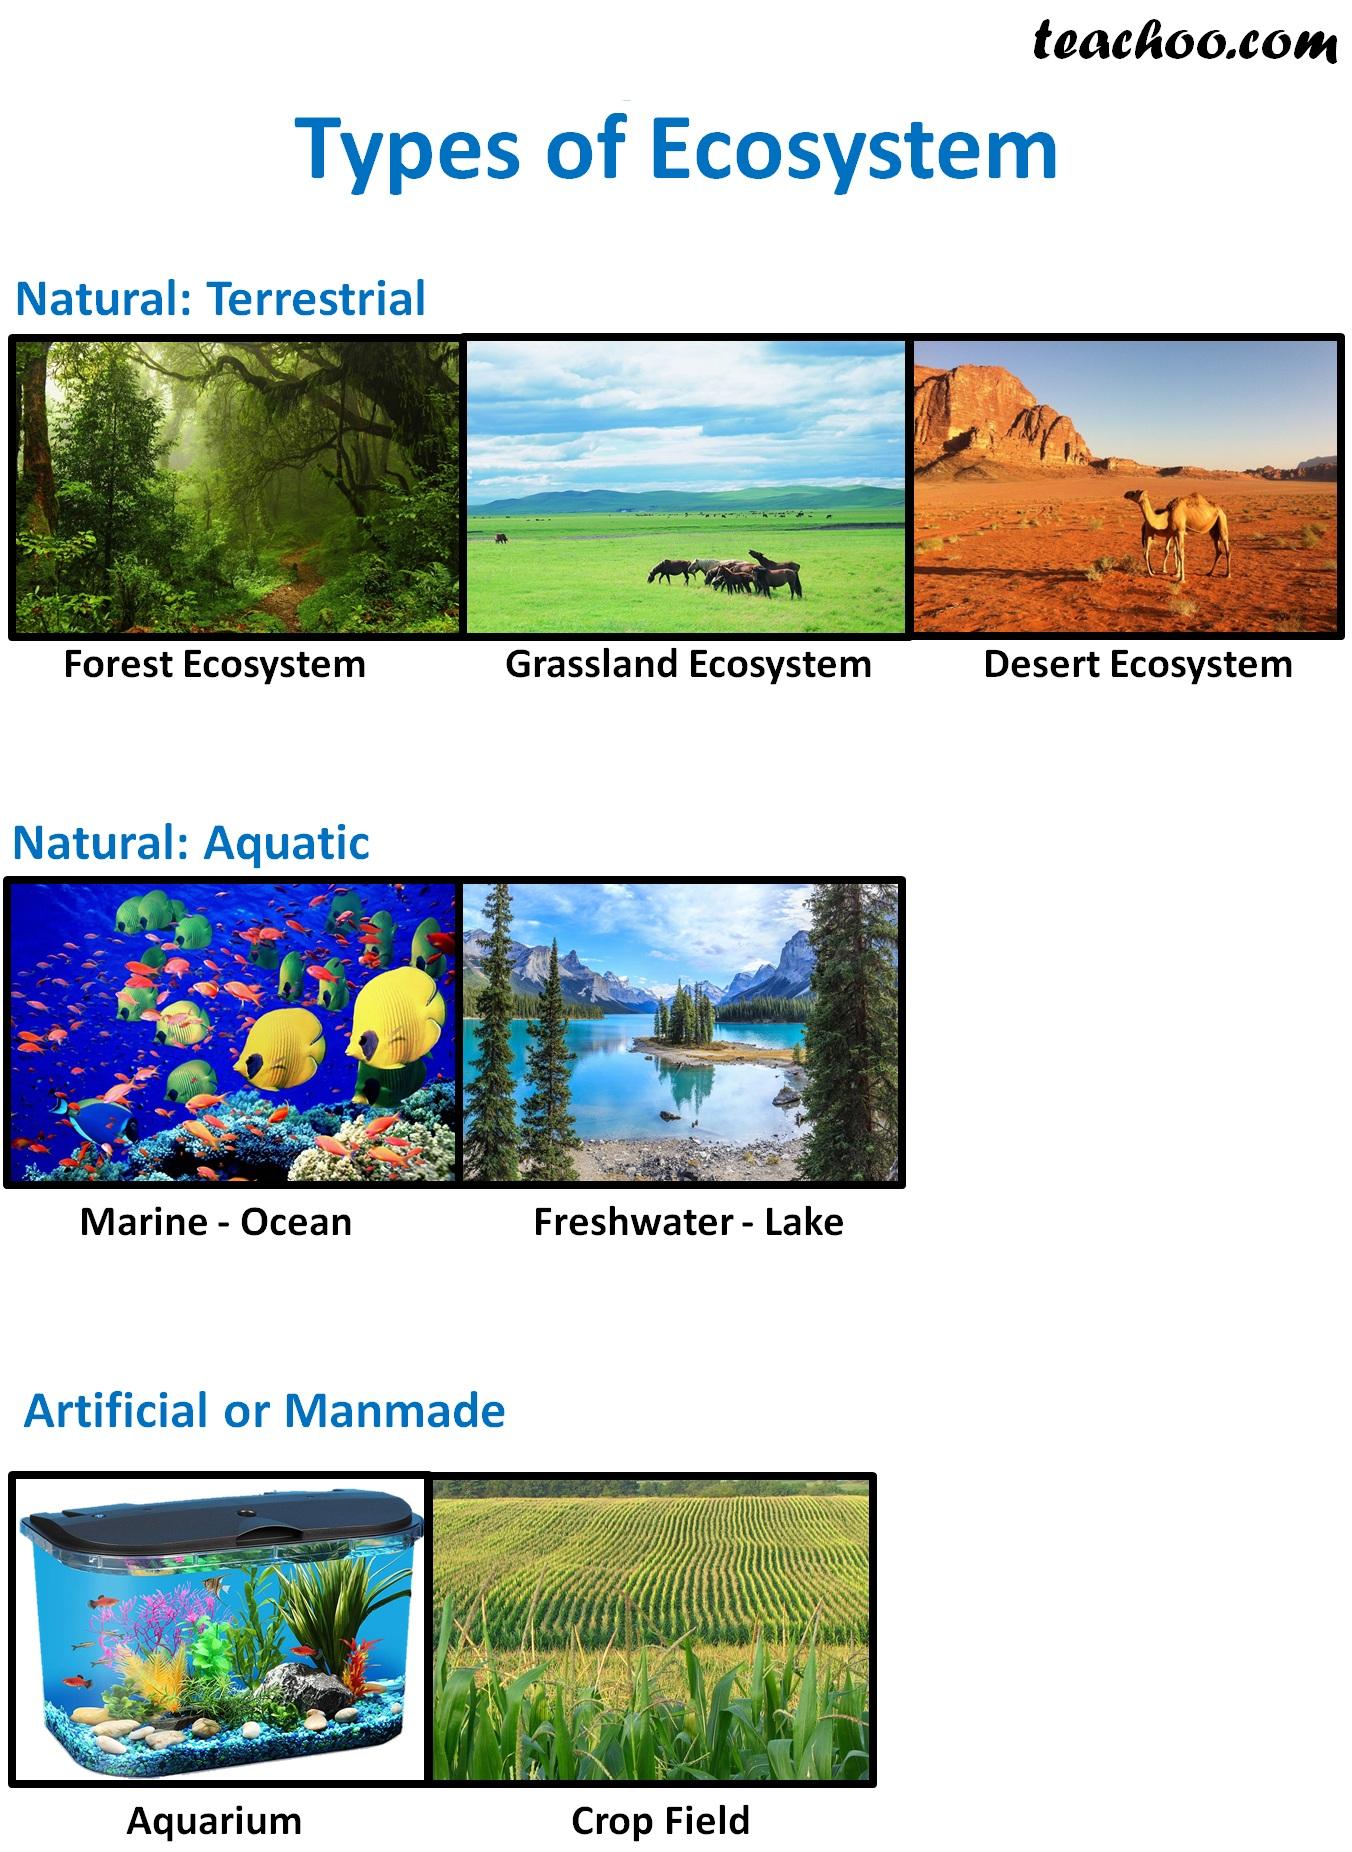 Types of Ecosystem - Teachoo.jpg